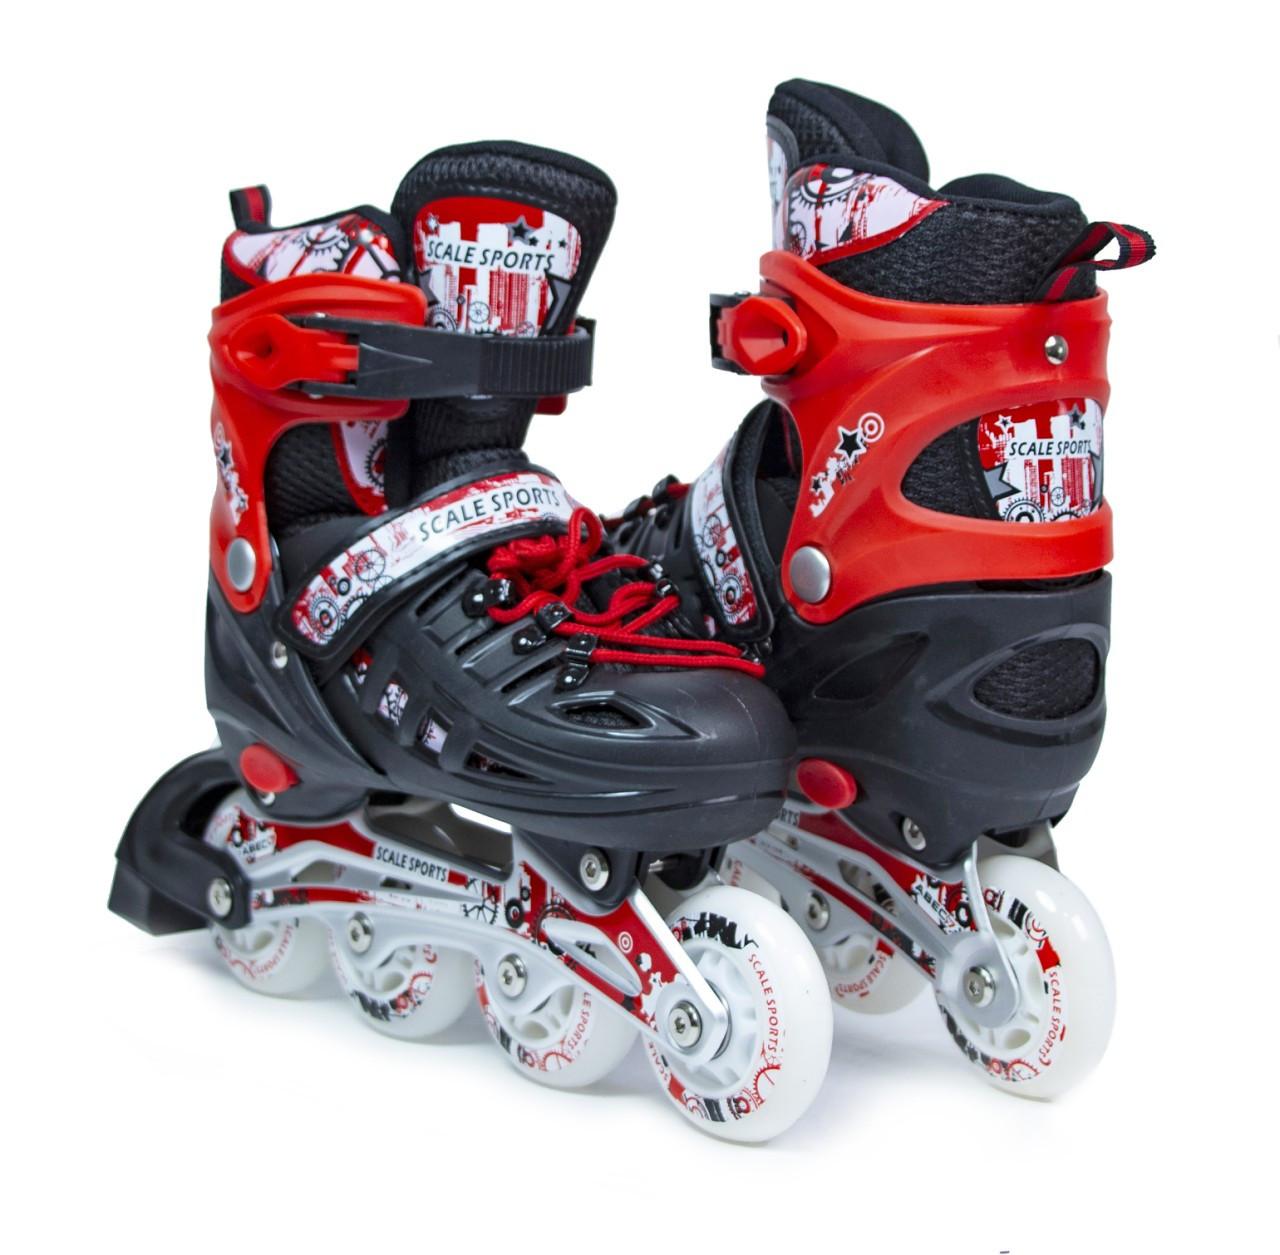 Ролики Scale Sports Red, размер 38-42